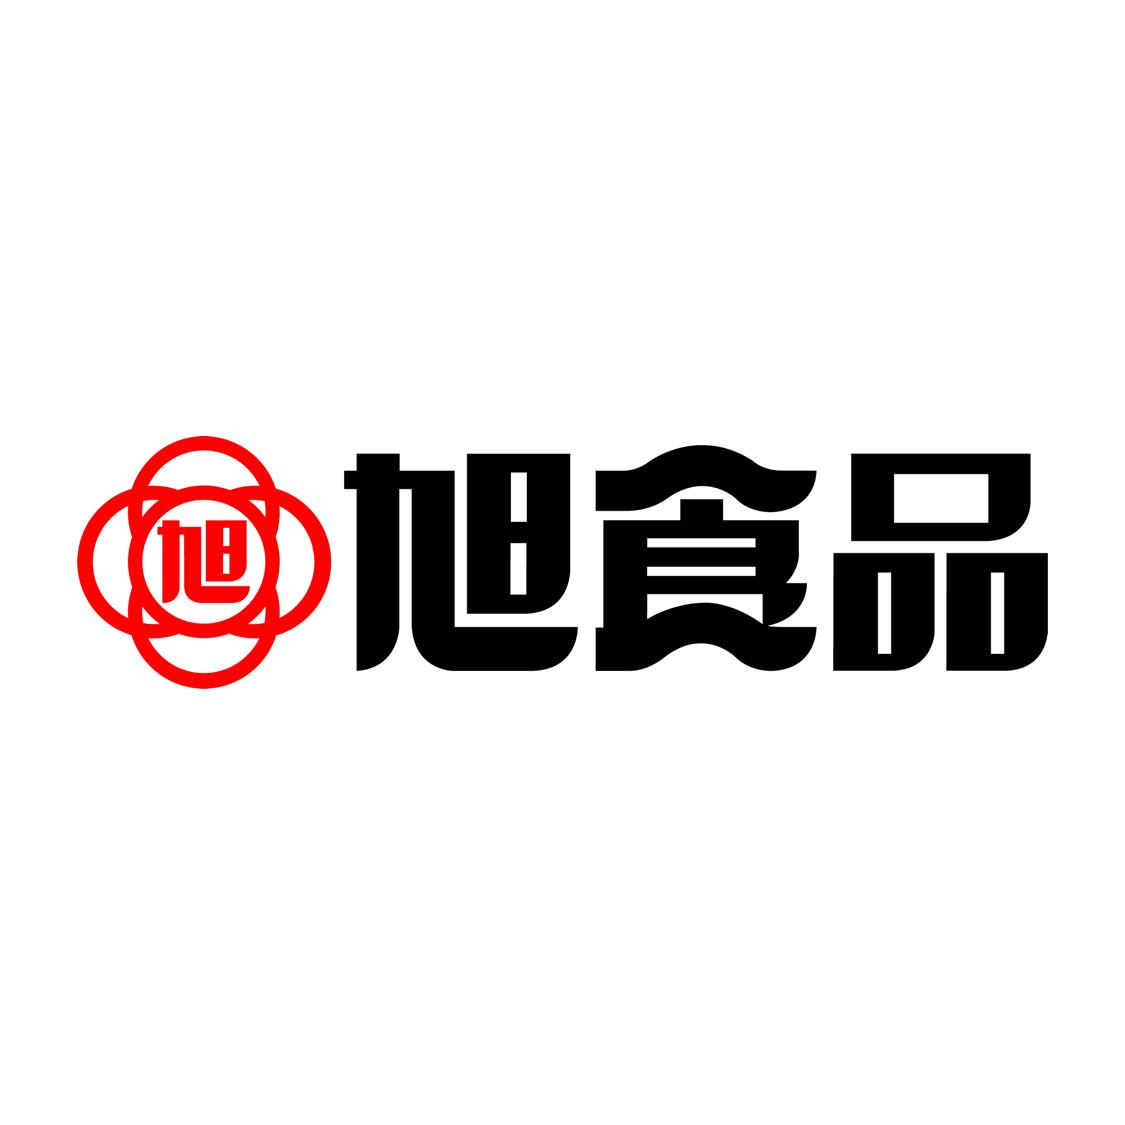 旭食品株式会社 企業ロゴ